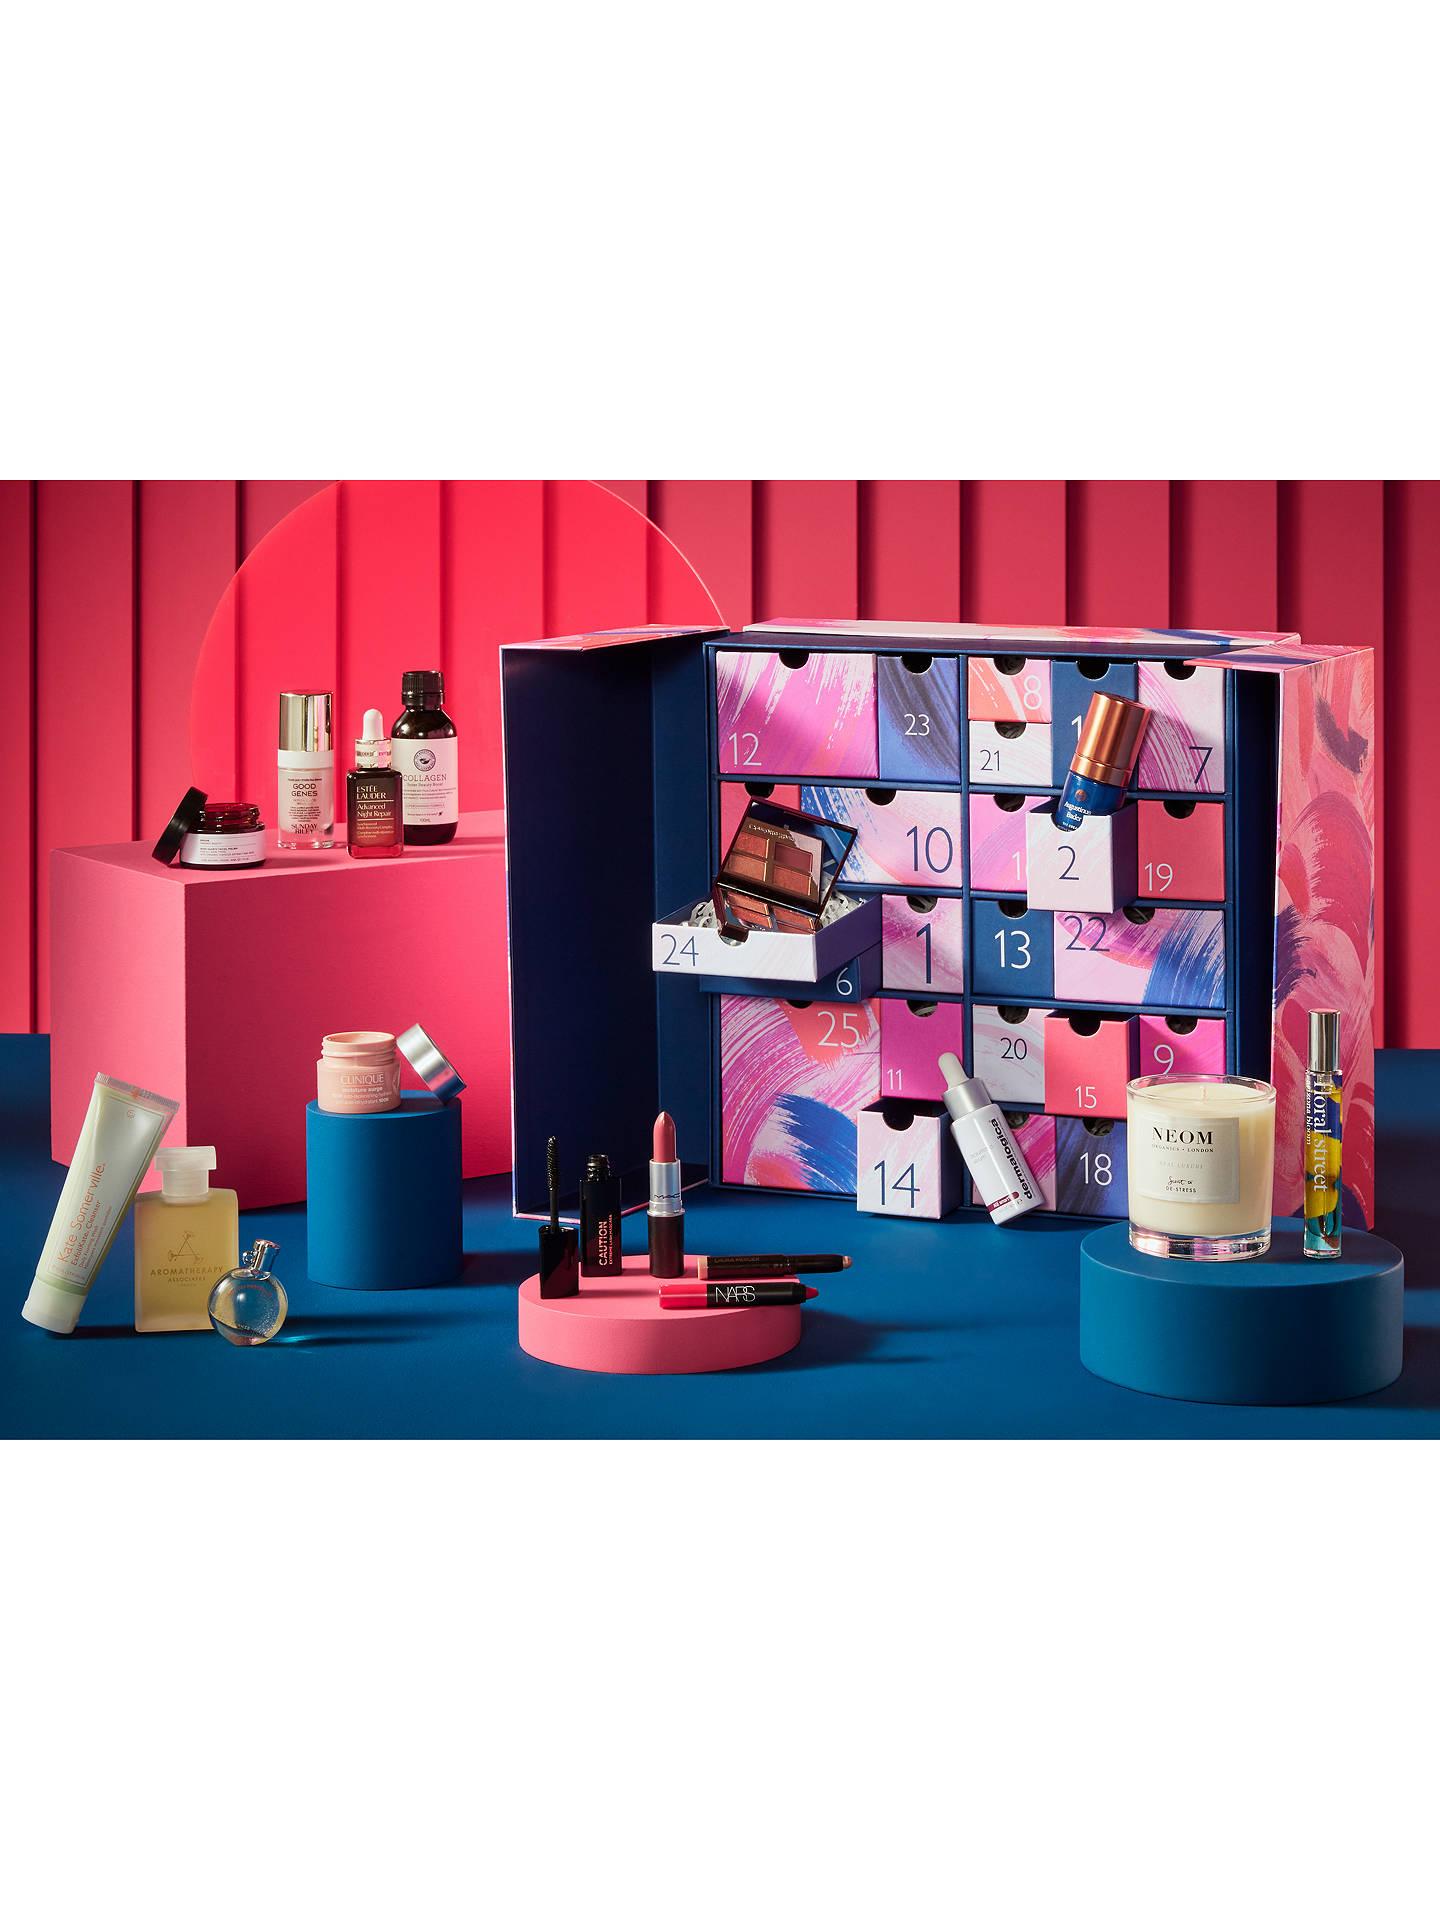 John Lewis & Partners Beauty Advent Calendar